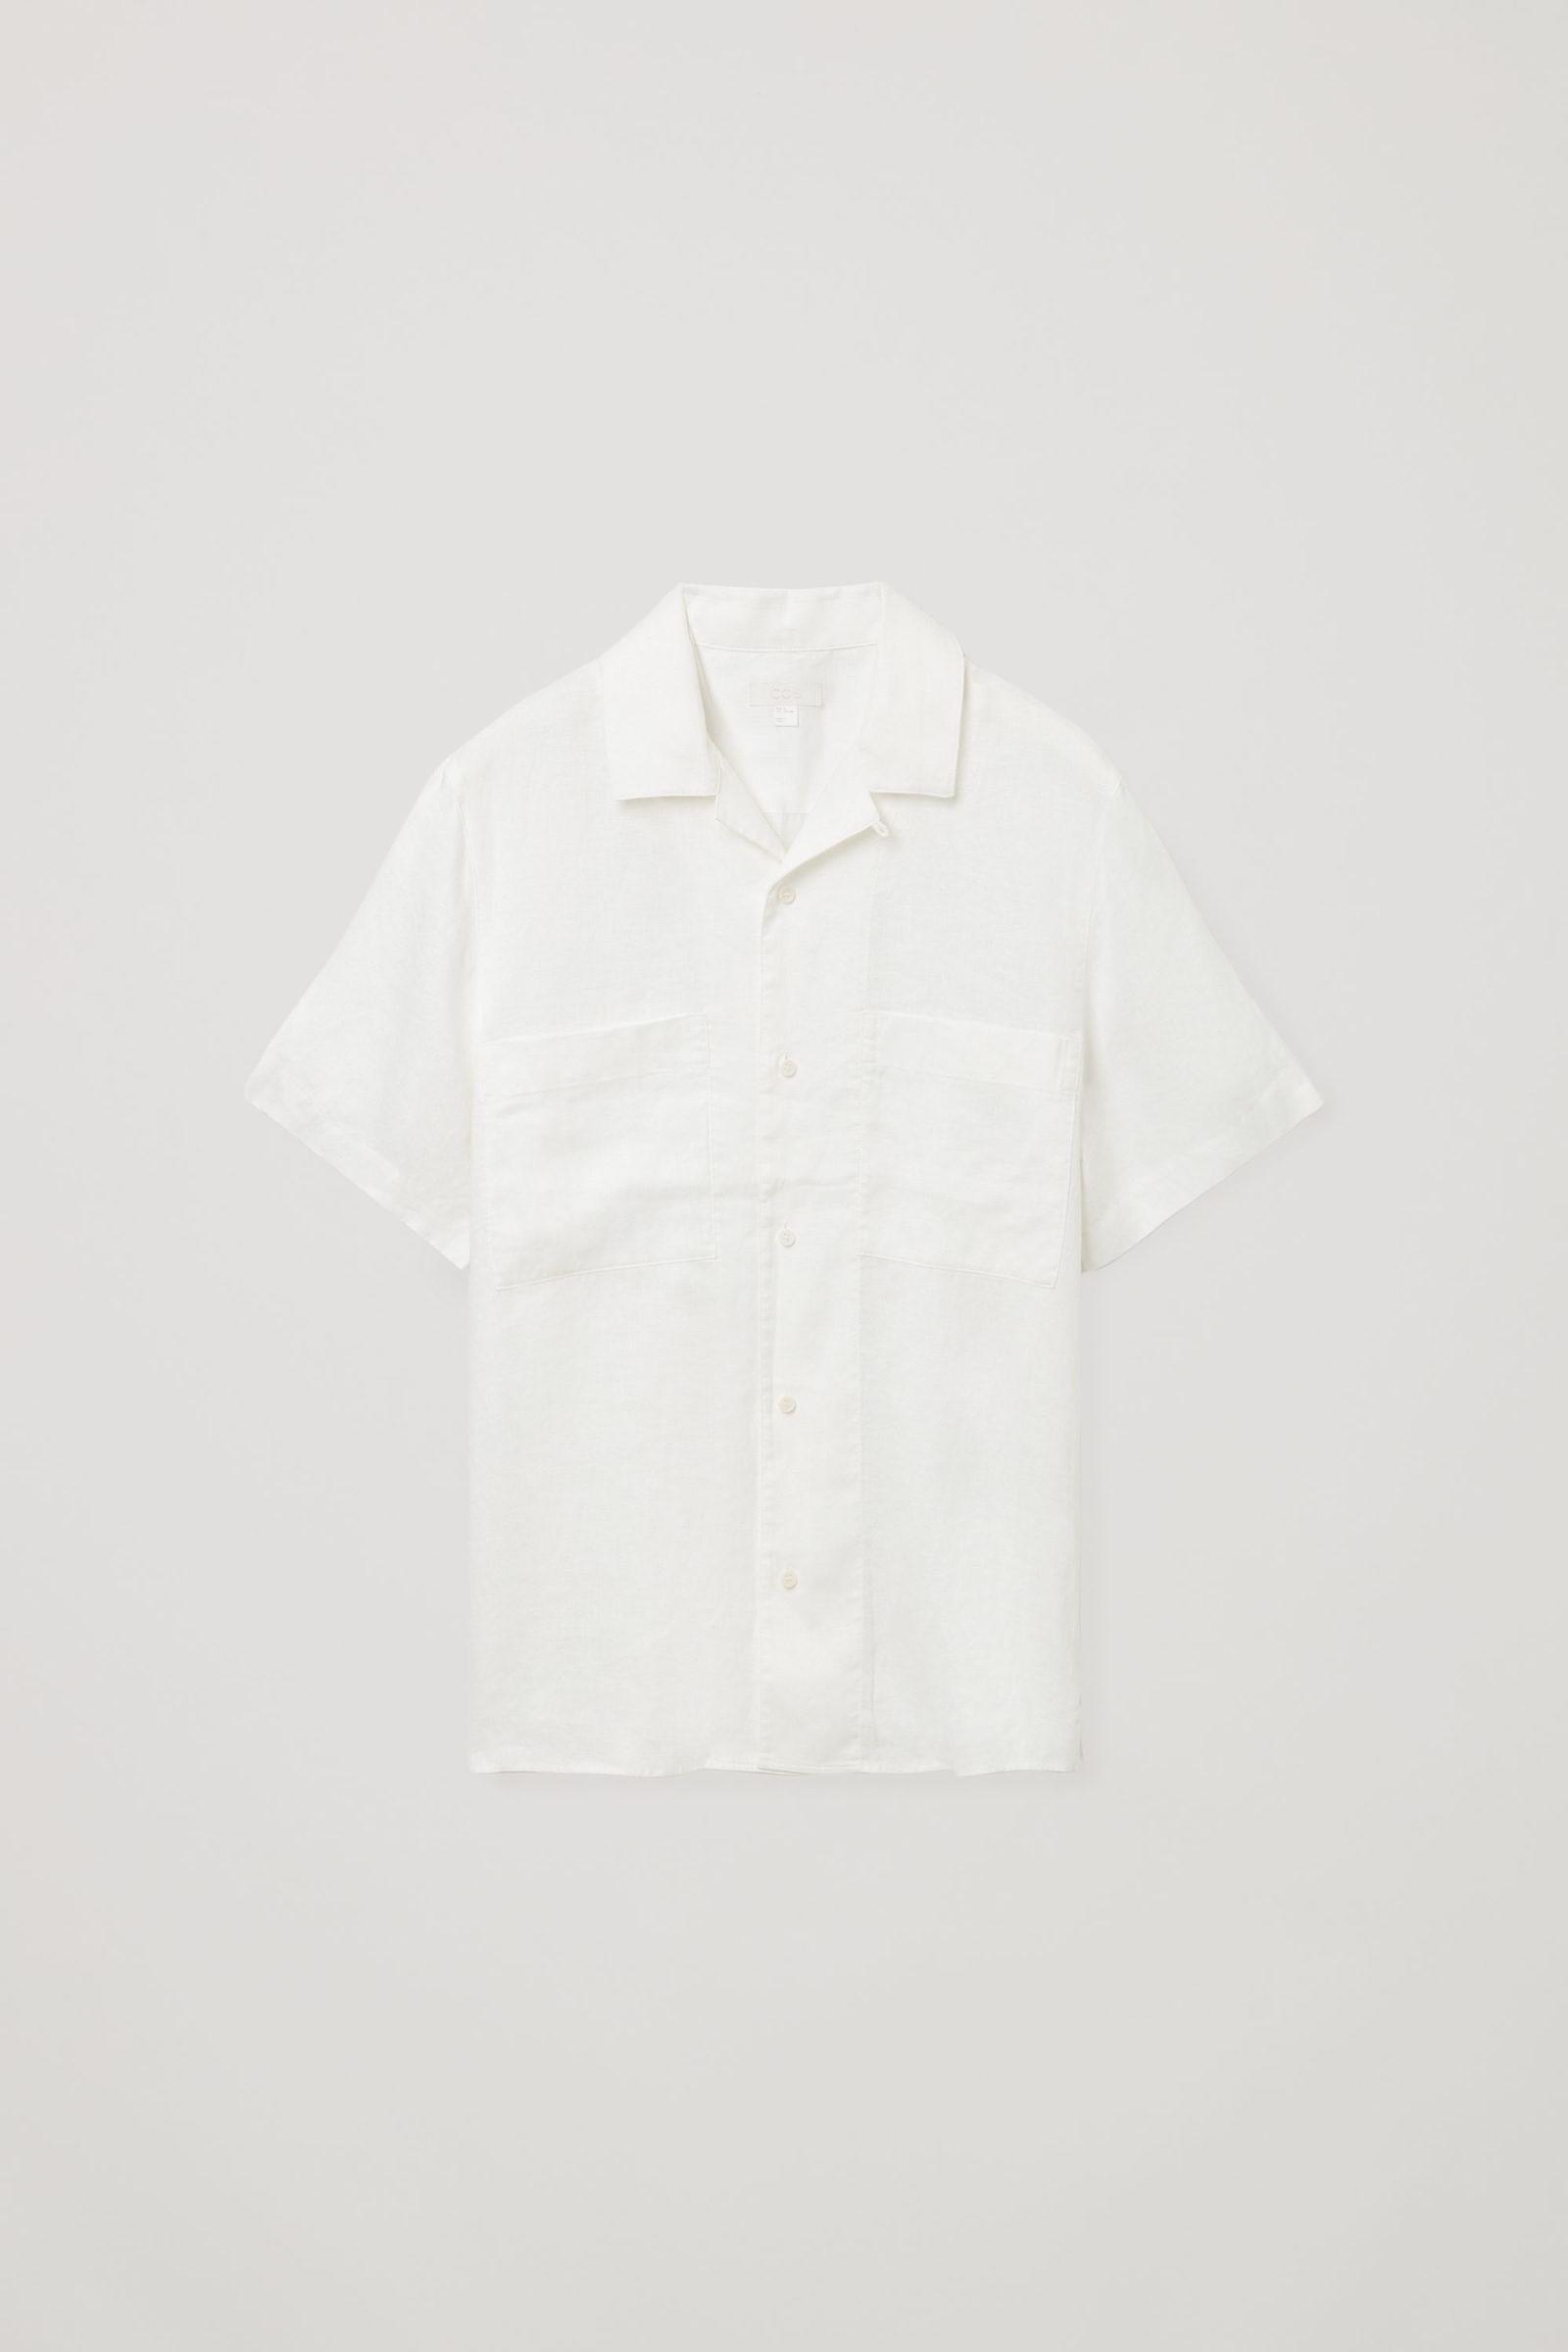 COS 캠프 칼라 쇼트 슬리브 셔츠의 화이트컬러 Product입니다.